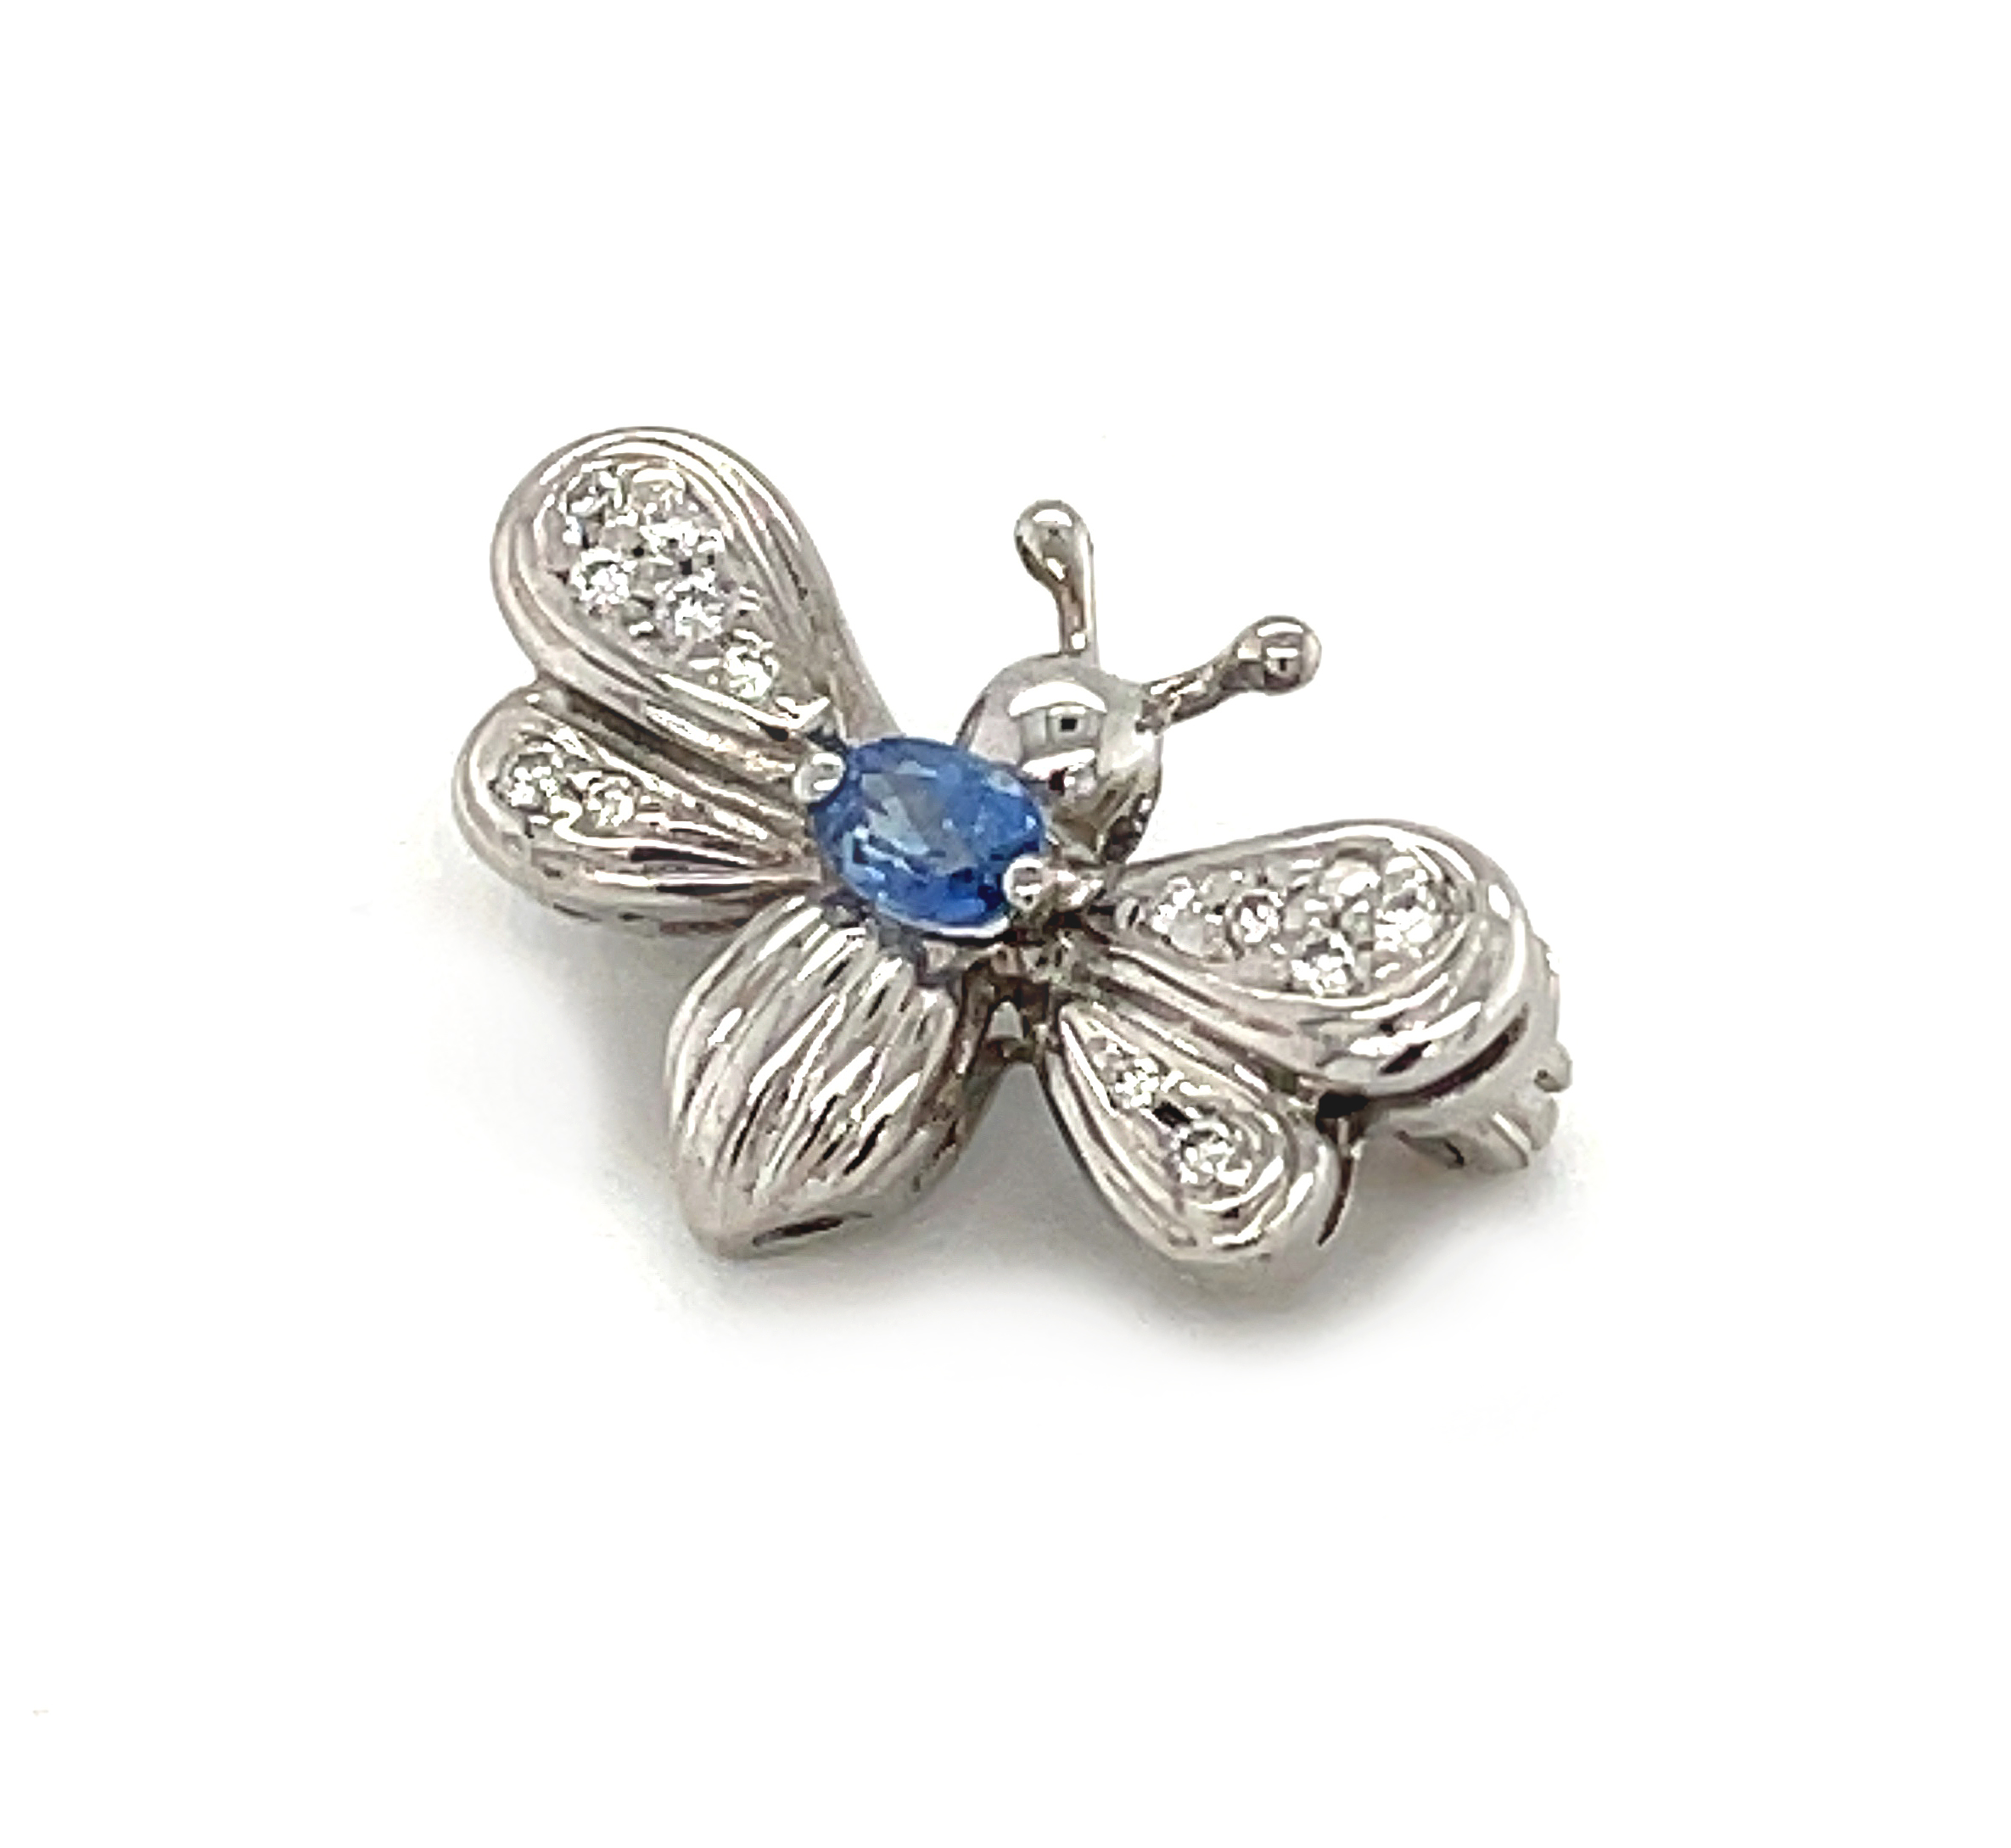 18k White Gold Sapphire & Diamond Butterfly Brooch